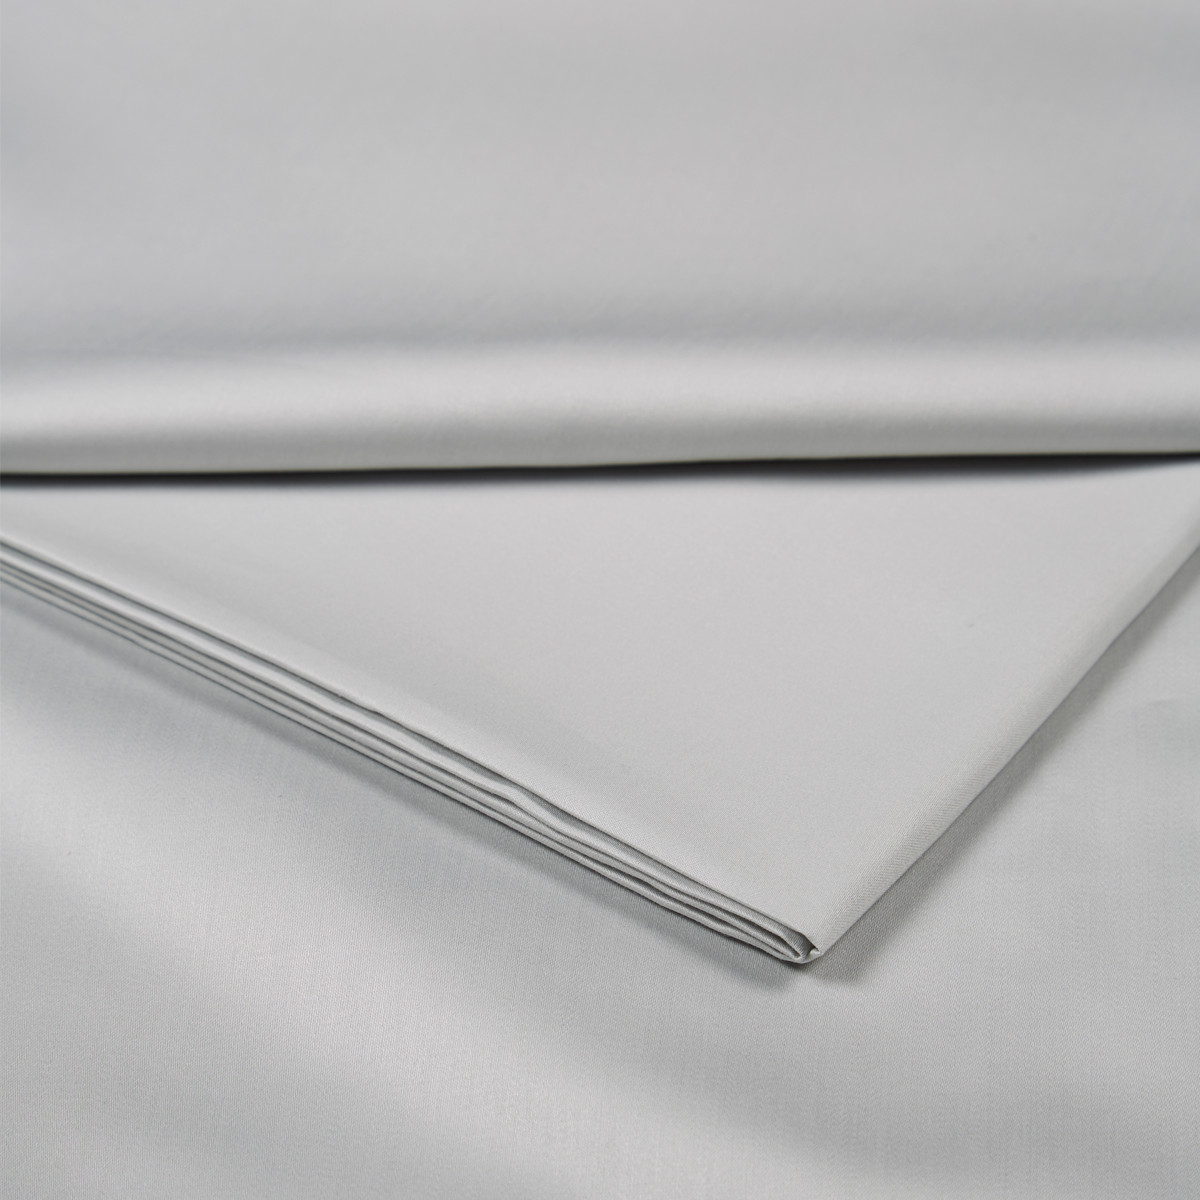 King Size Pillowcases (pair) 400 TC Cotton Sateen Platinium